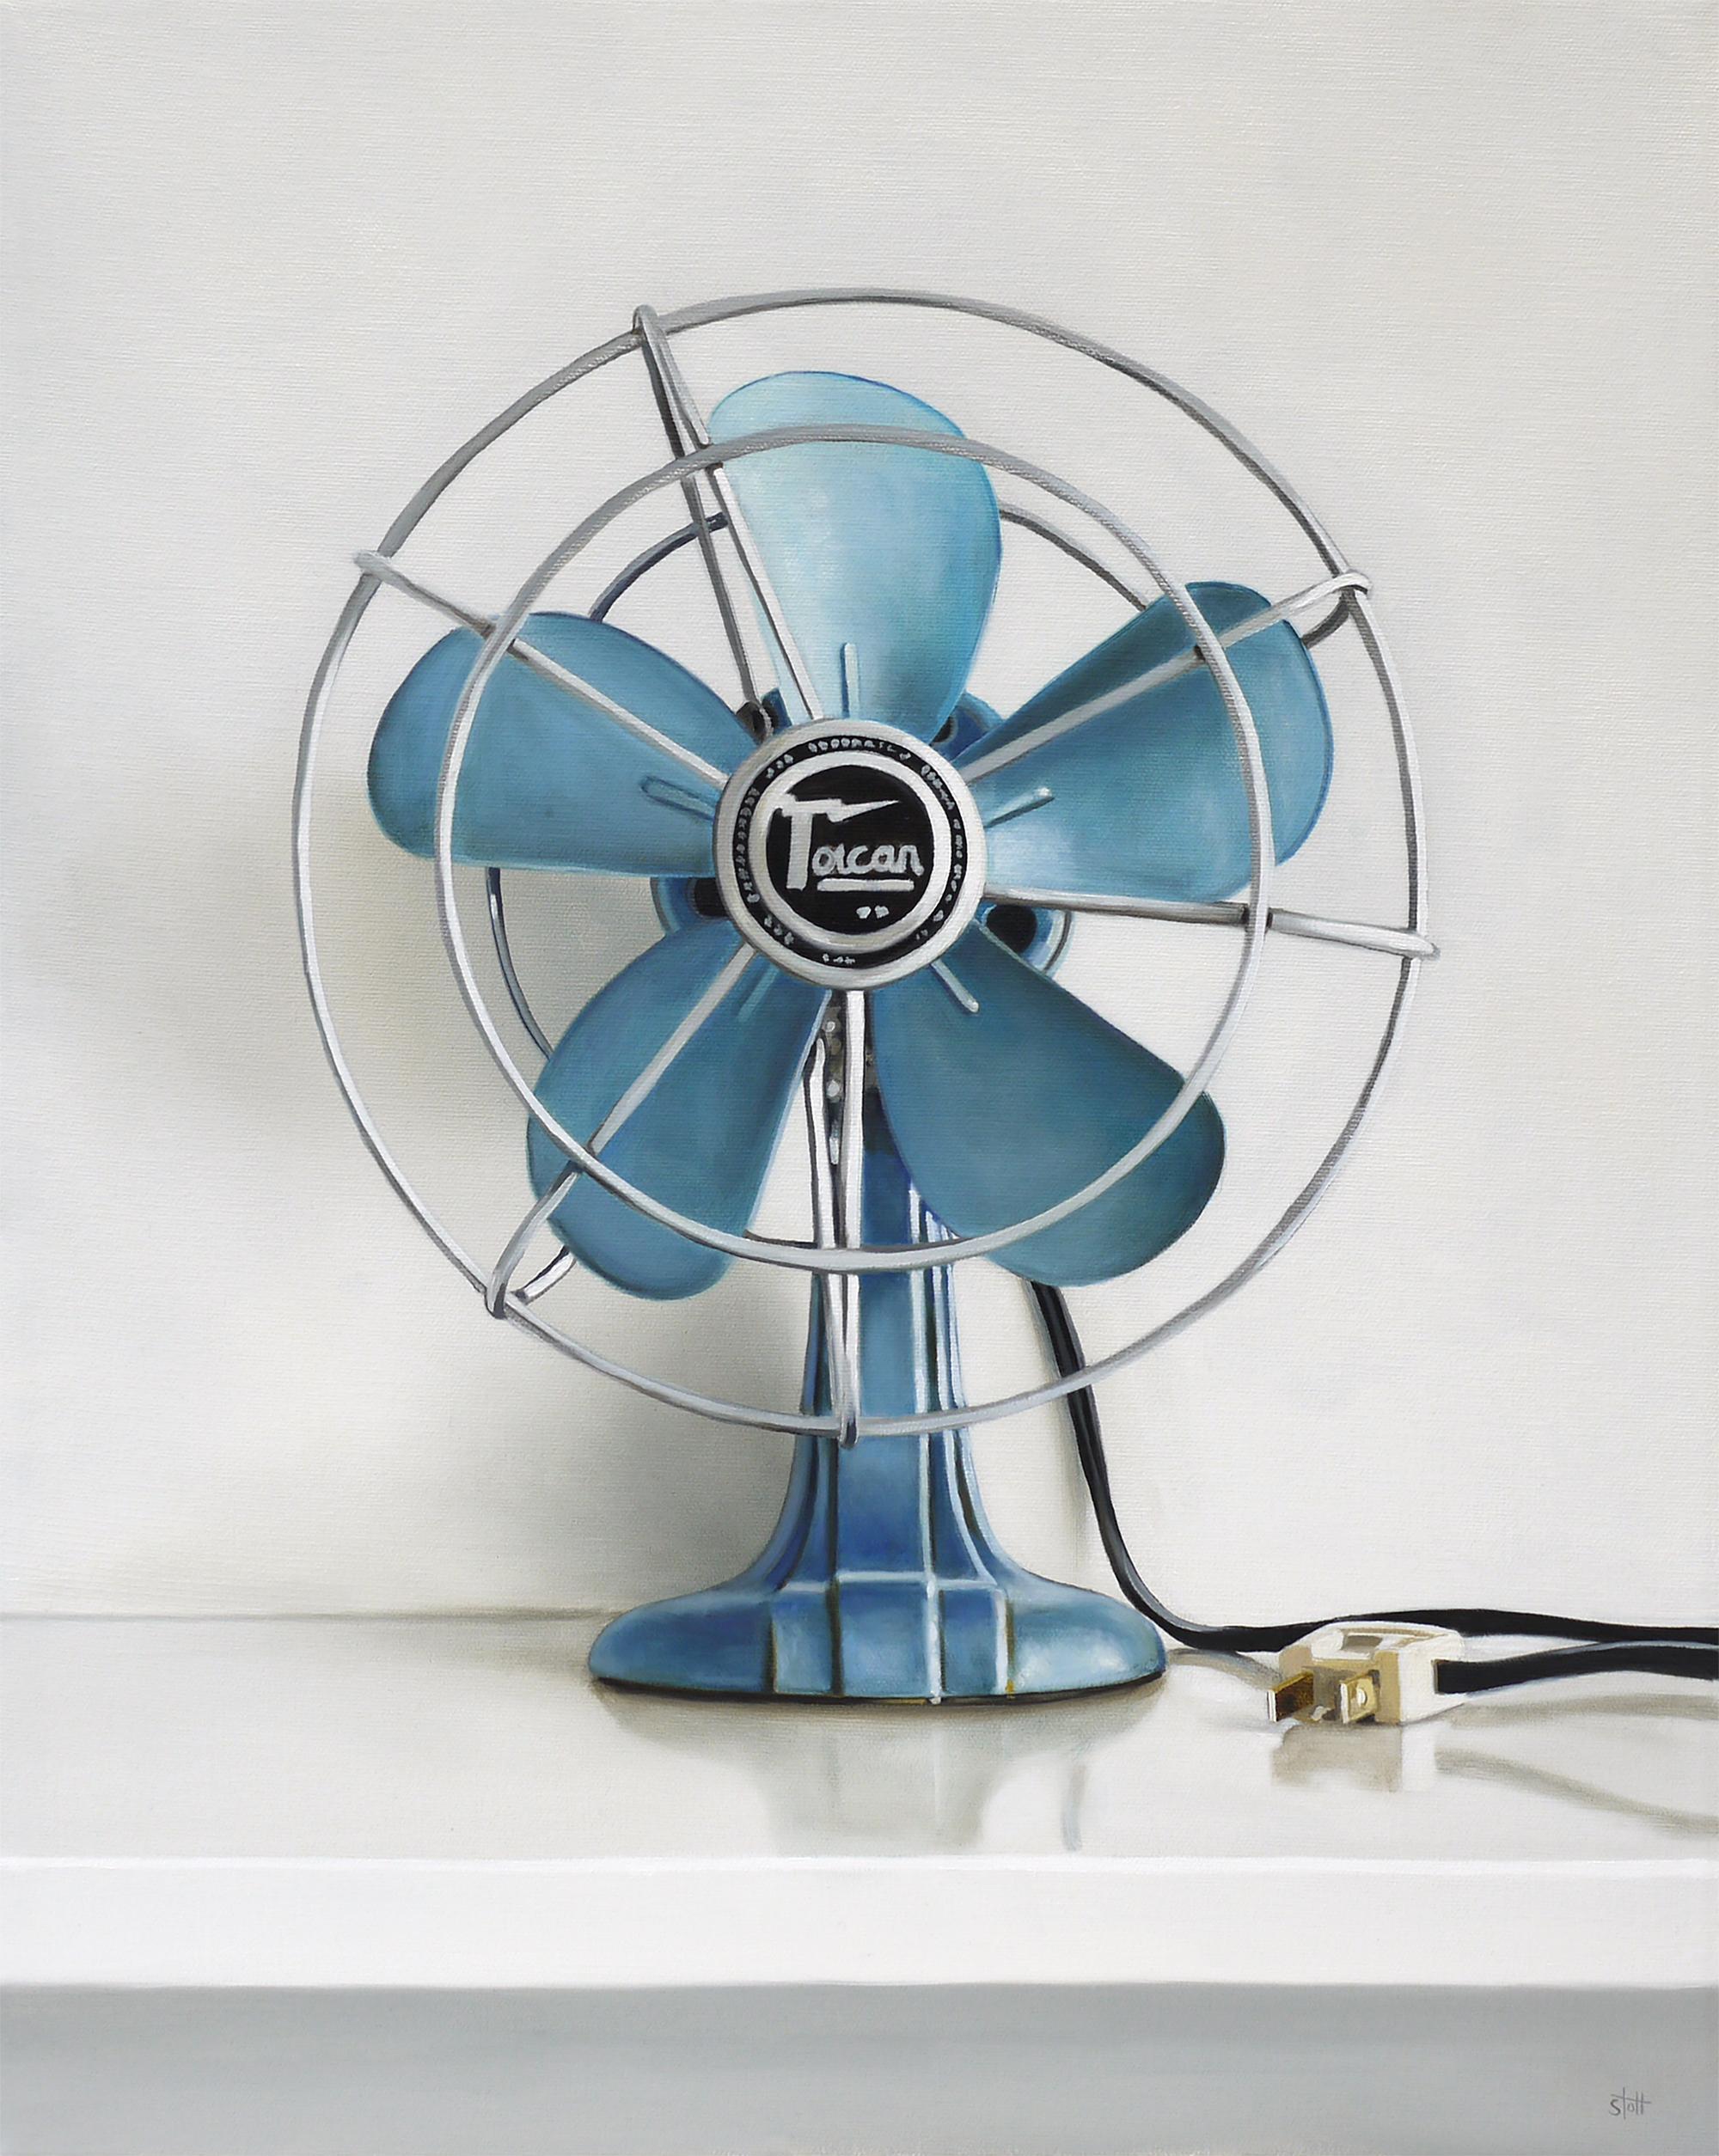 Vintage Toucan Electric Fan by Christopher Stott